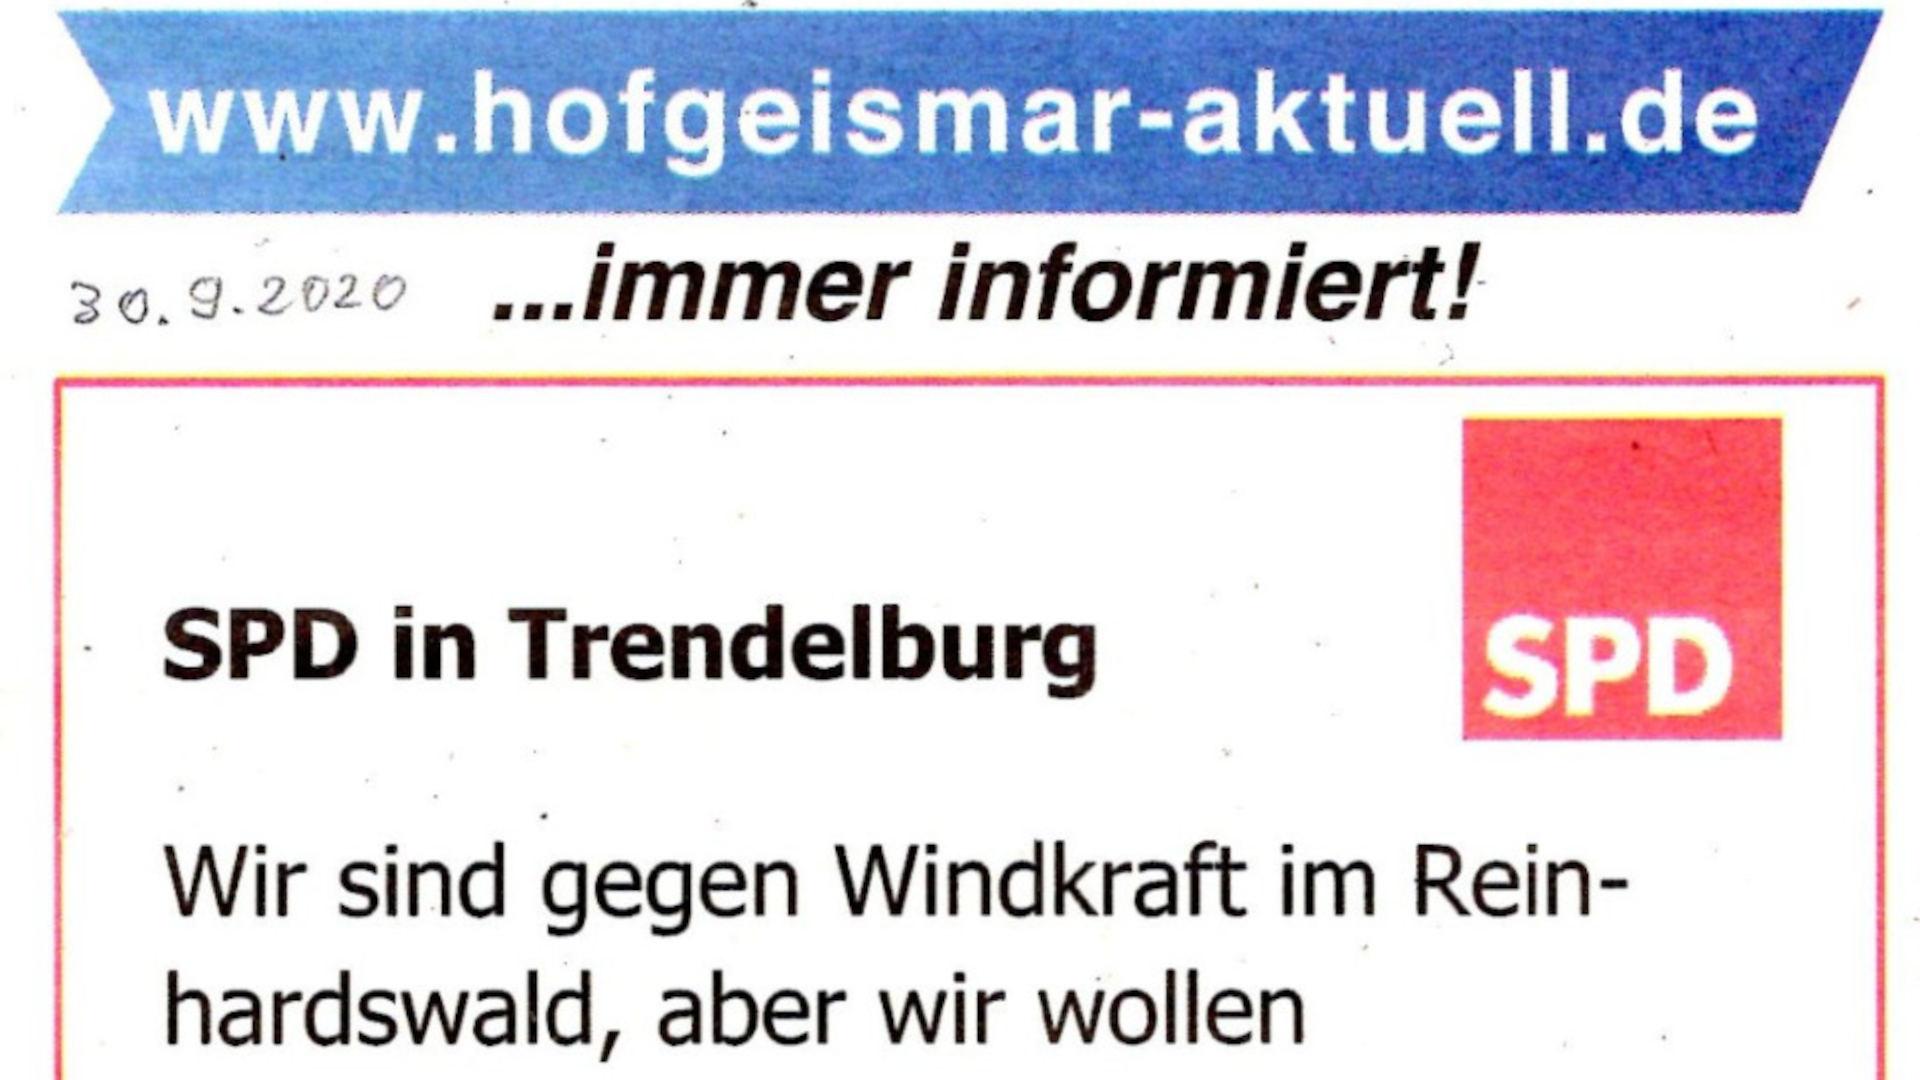 Trendelburgs SPD am Tiefpunkt